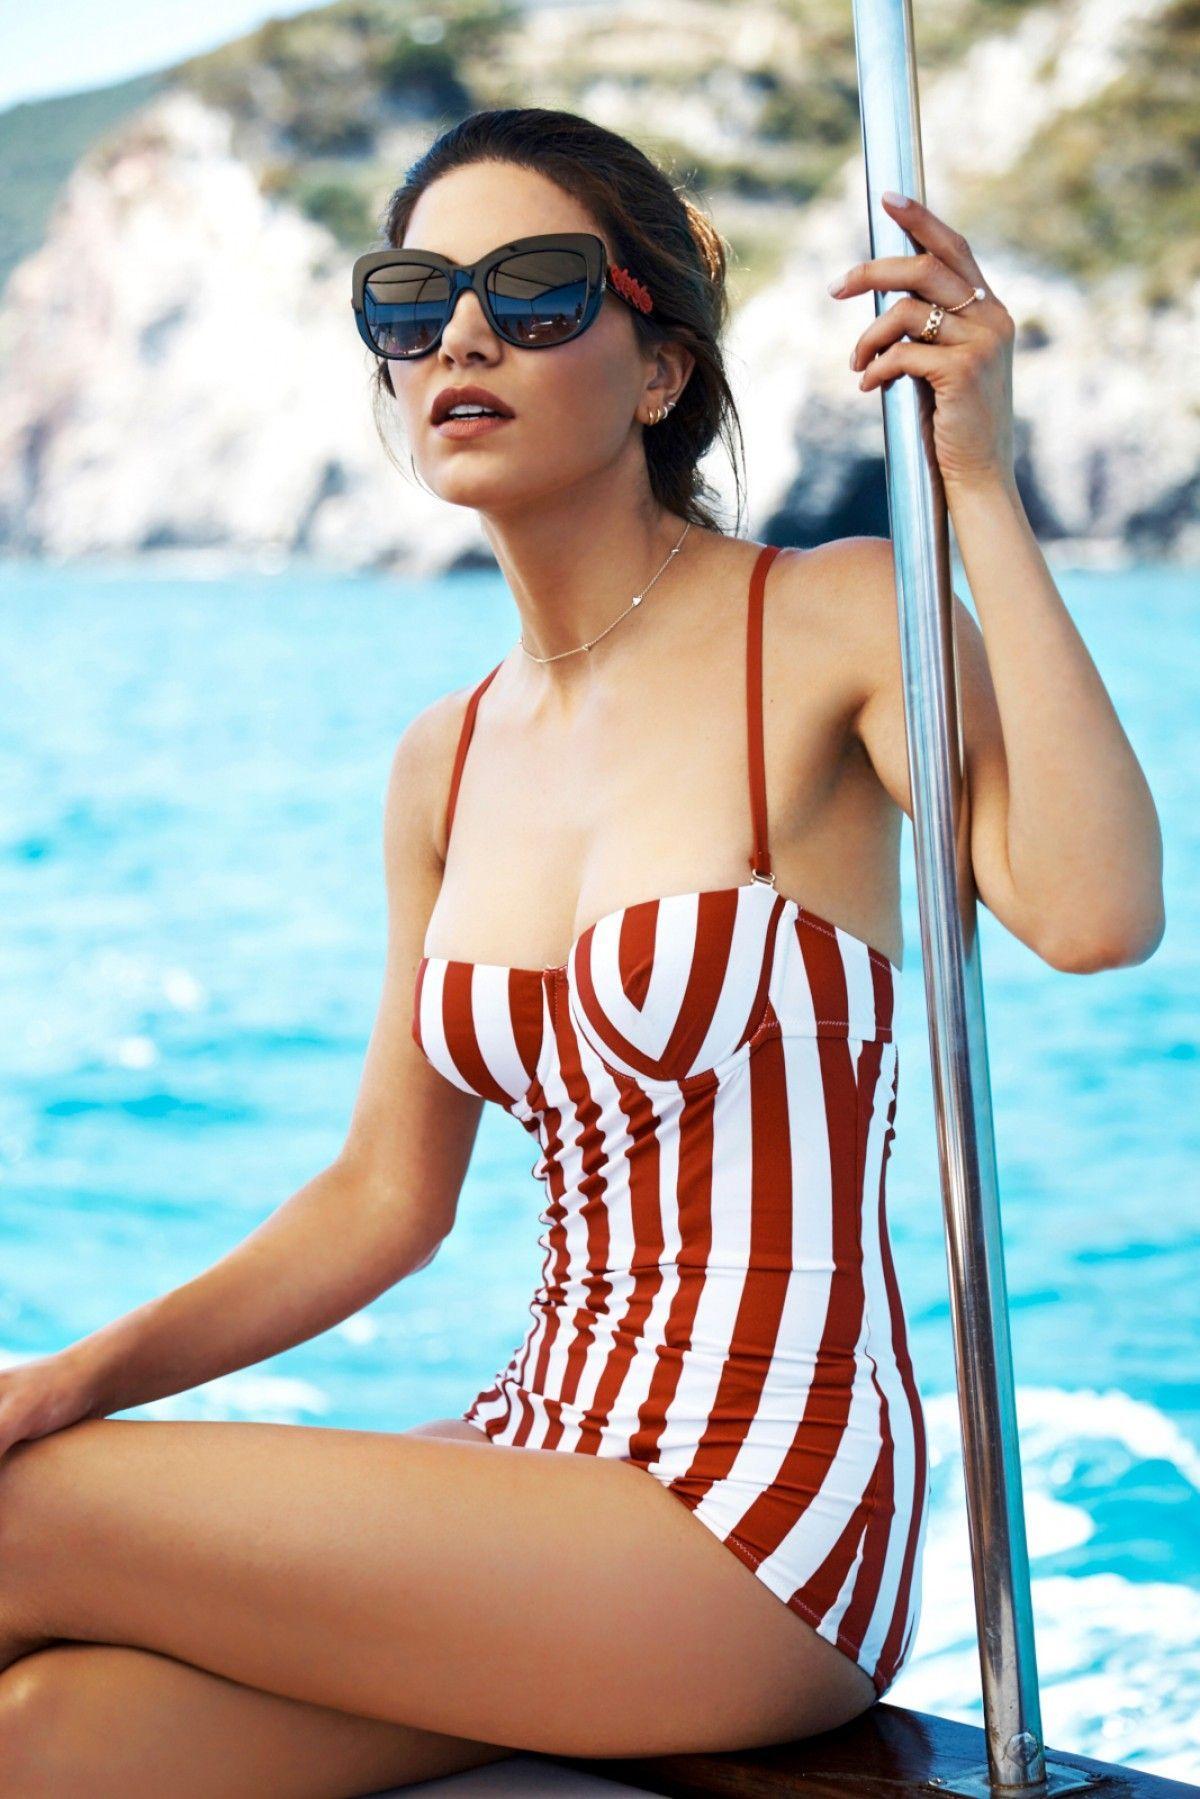 d2d78d7df17 Negin Mirsalehi in a retro bathing suit look by Dolce & Gabbana ...